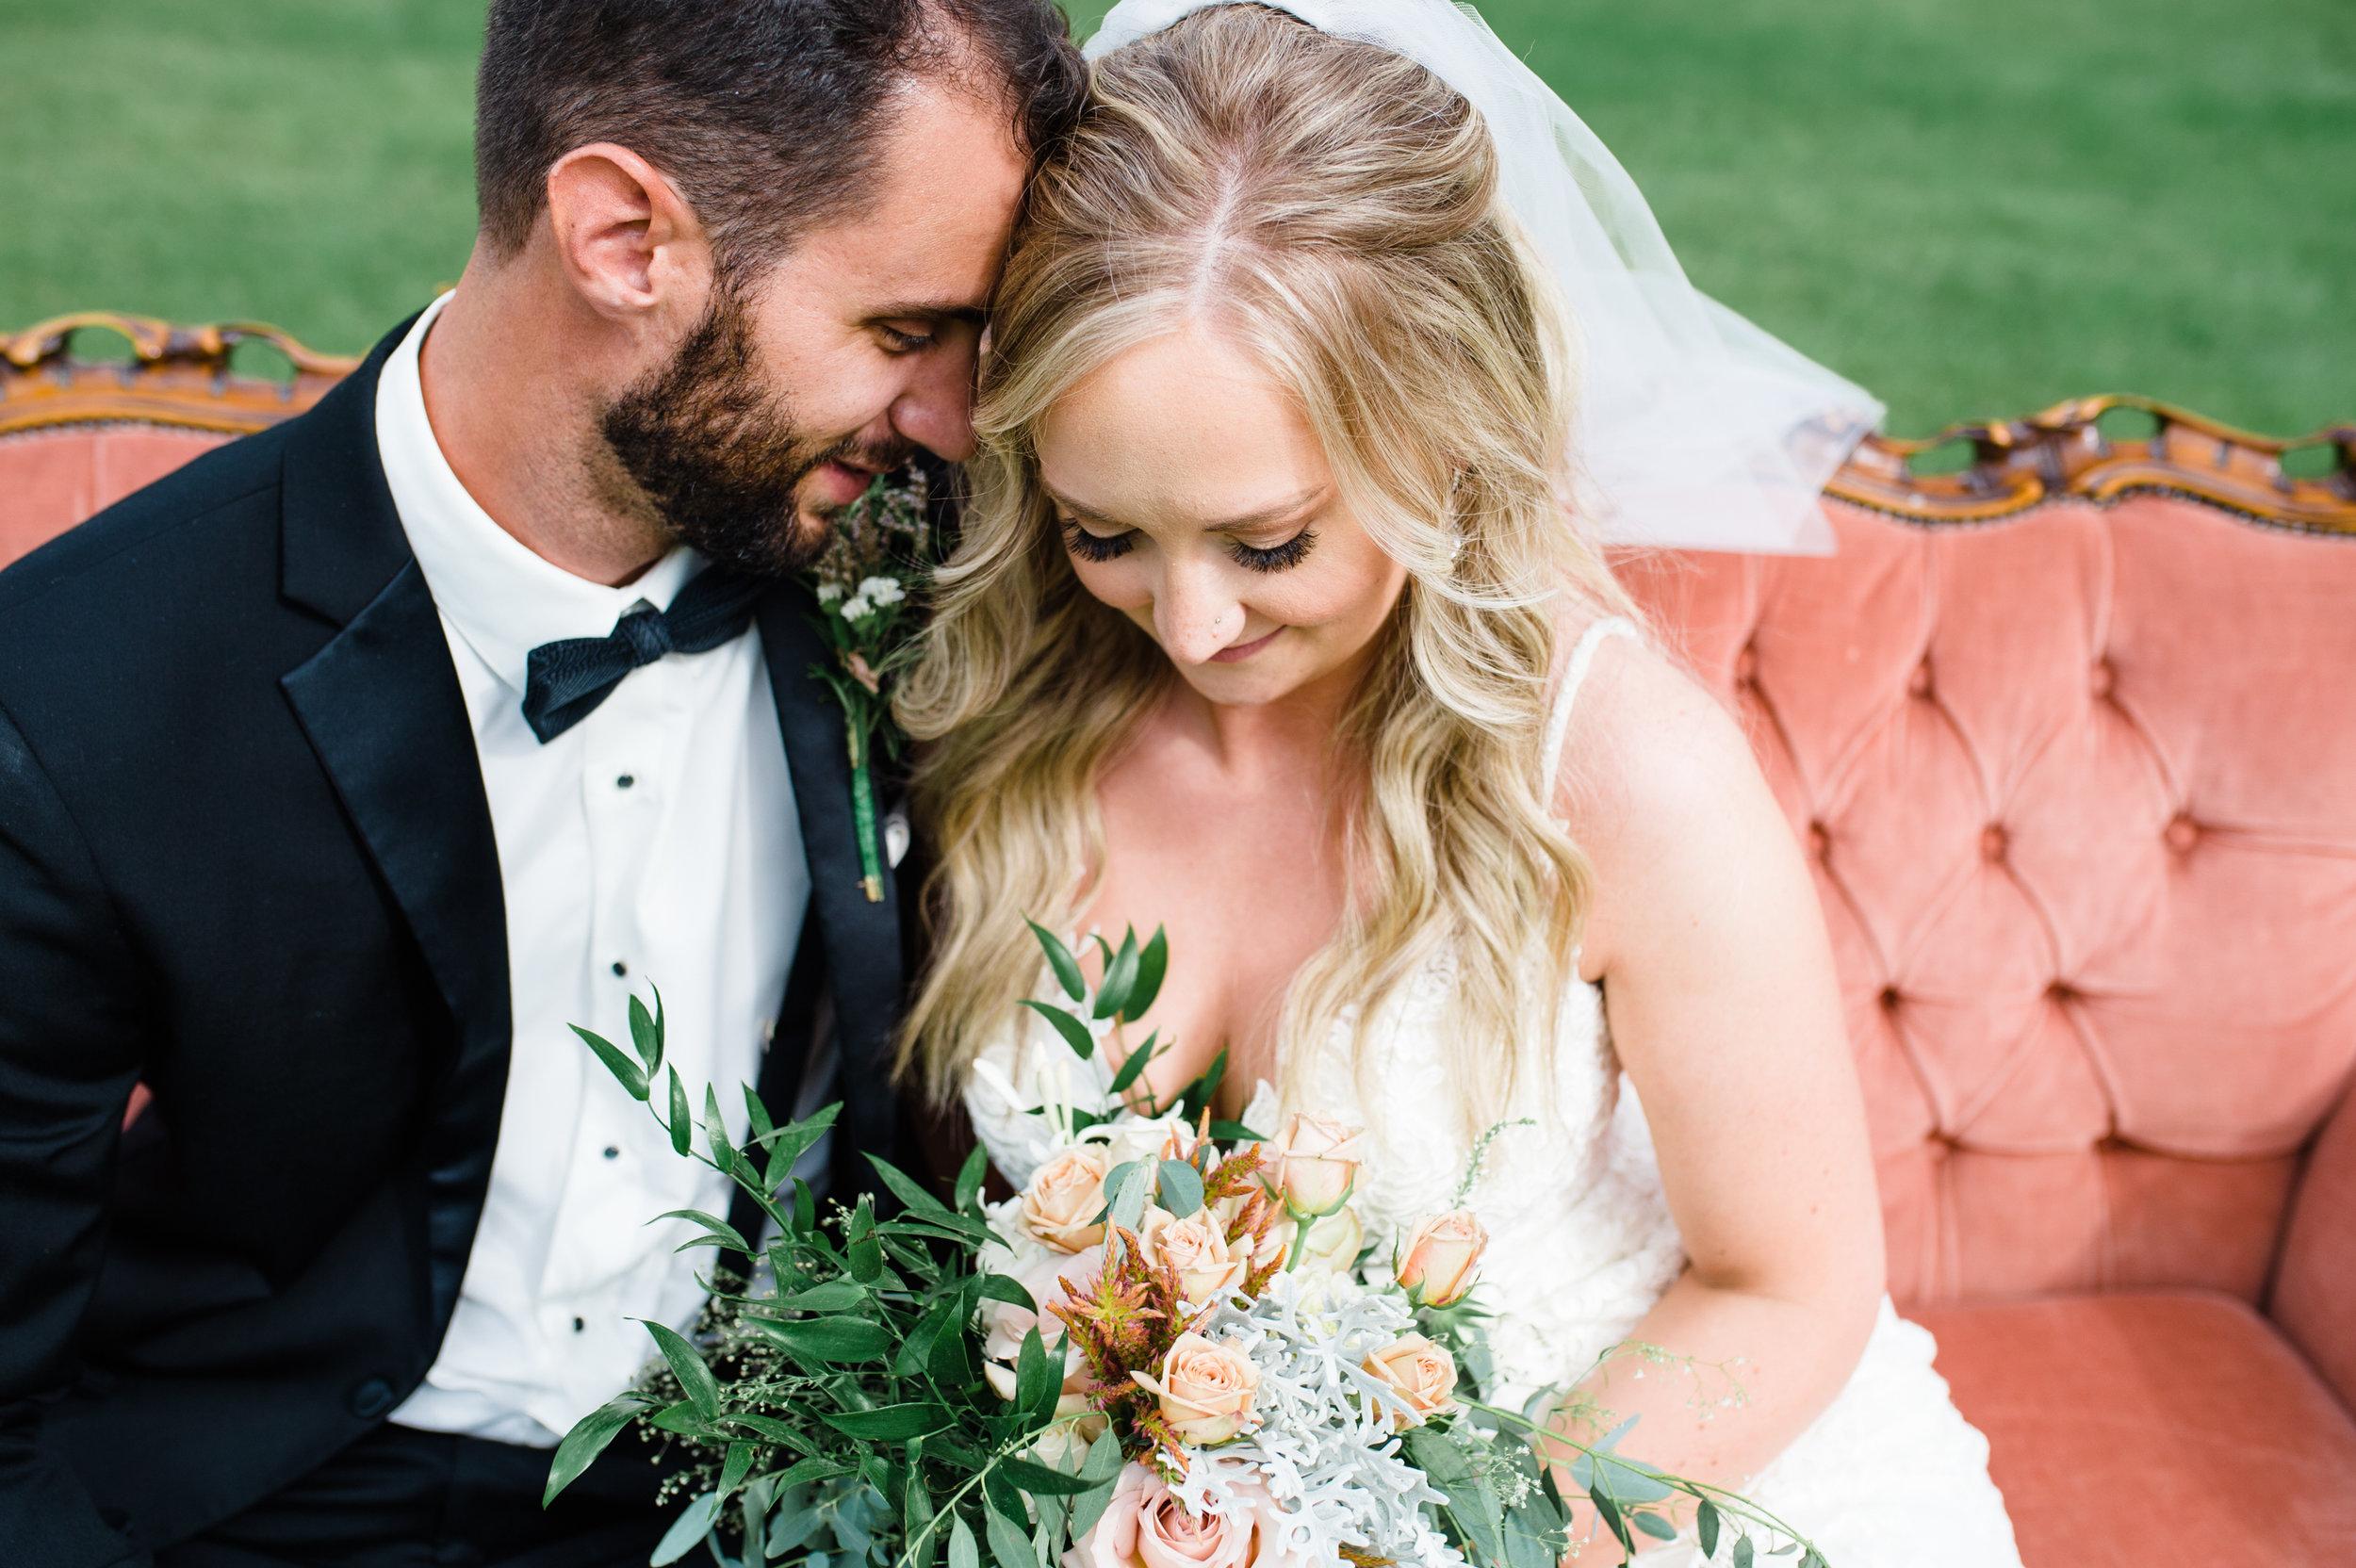 021Sky Ridge Ranch Wedding_Montana Wedding Photographer_Jessica & Brian_Honeybee Weddings_August 24, 2019-14.jpg